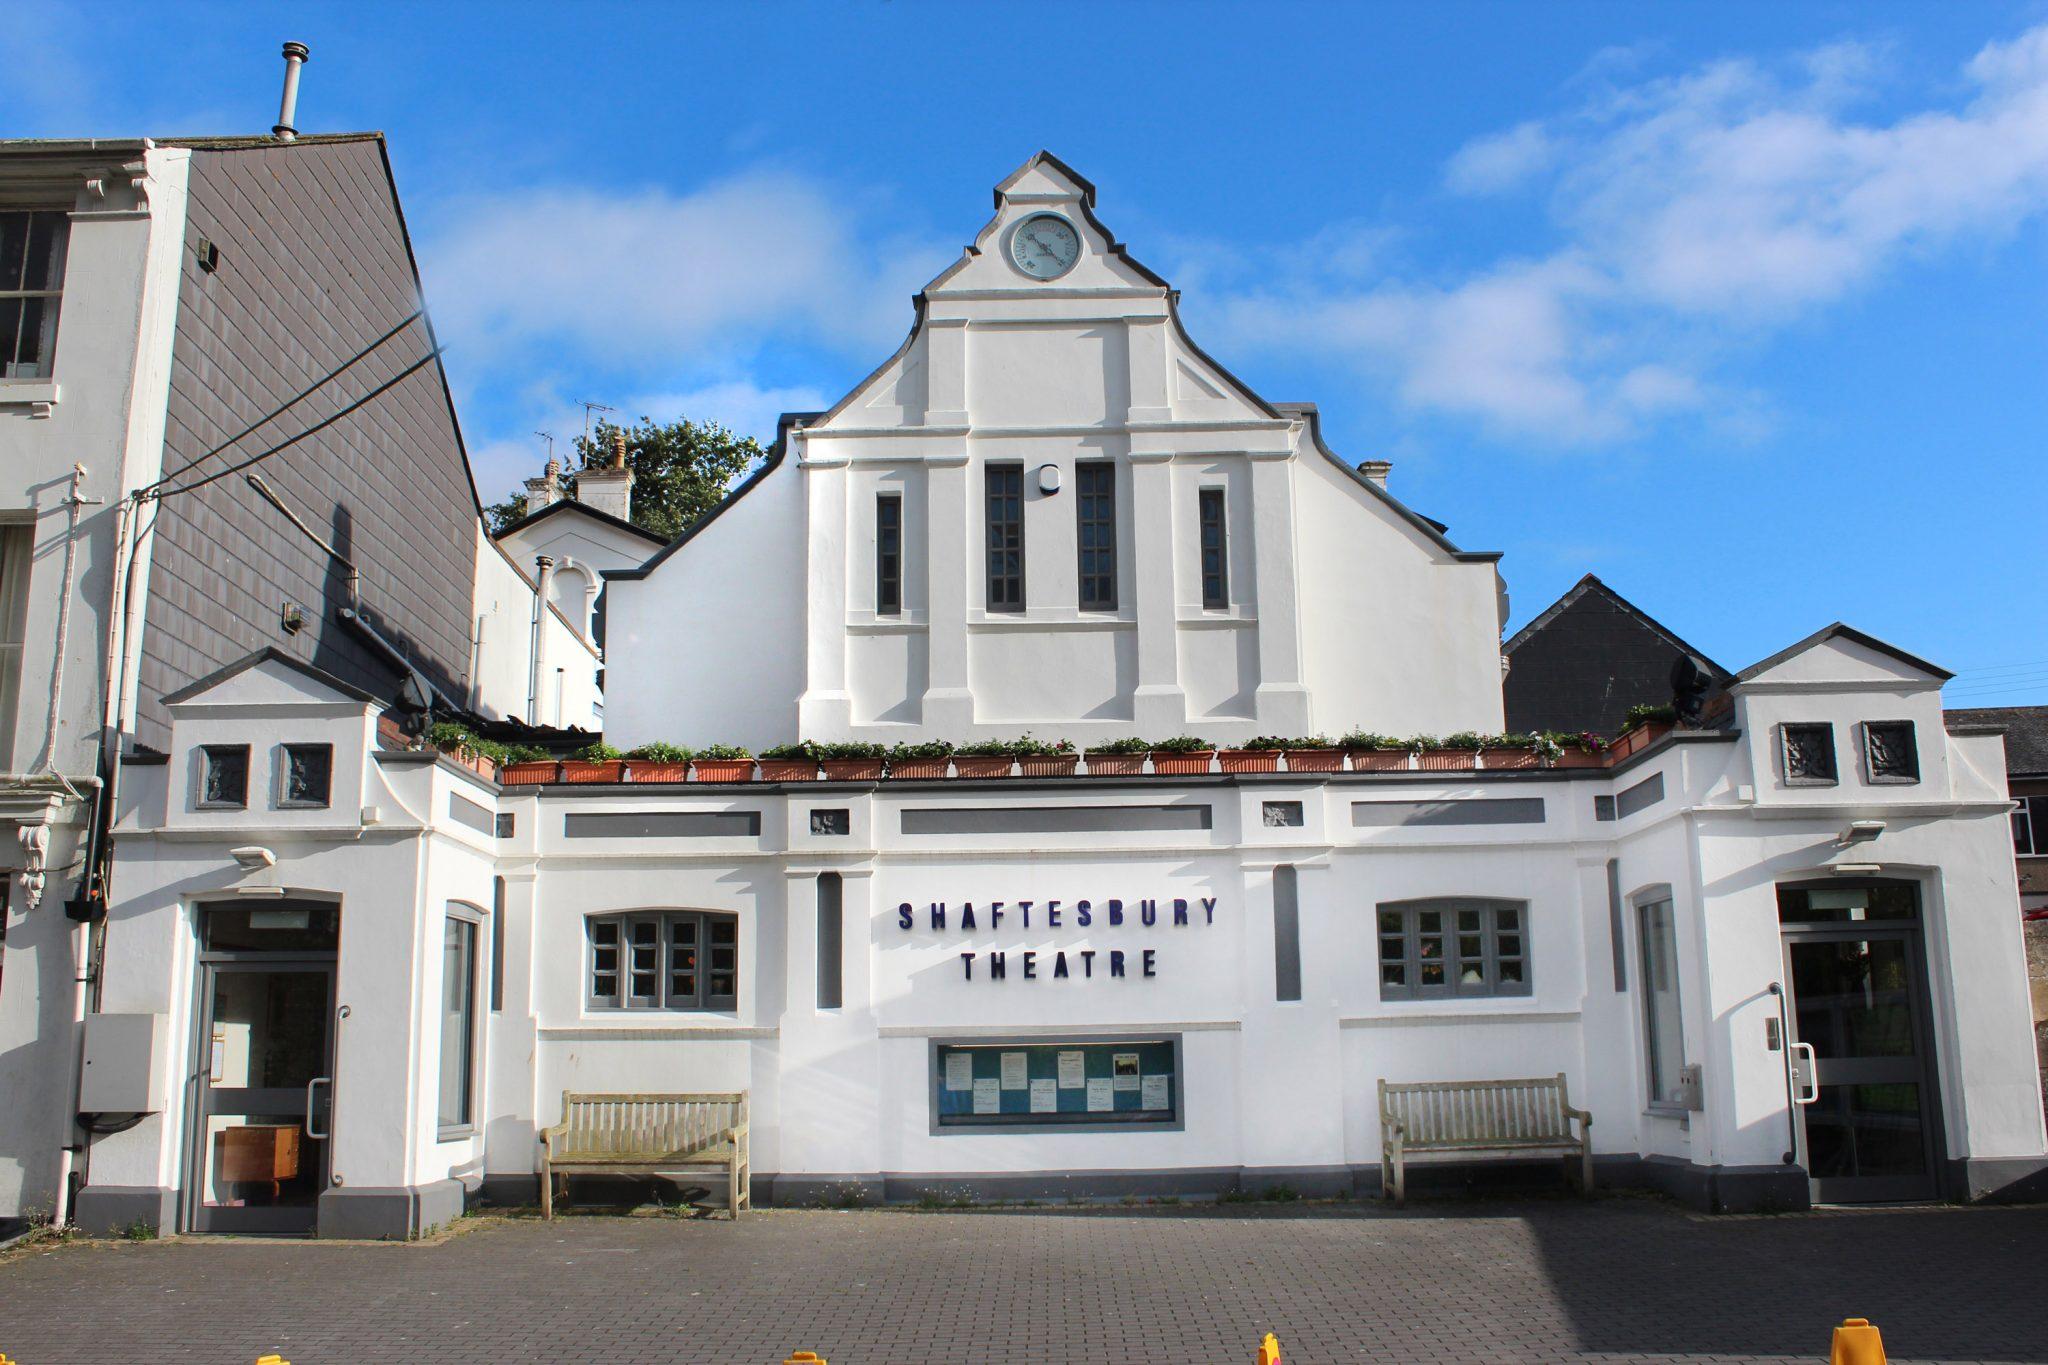 Shaftsbury_Theatre